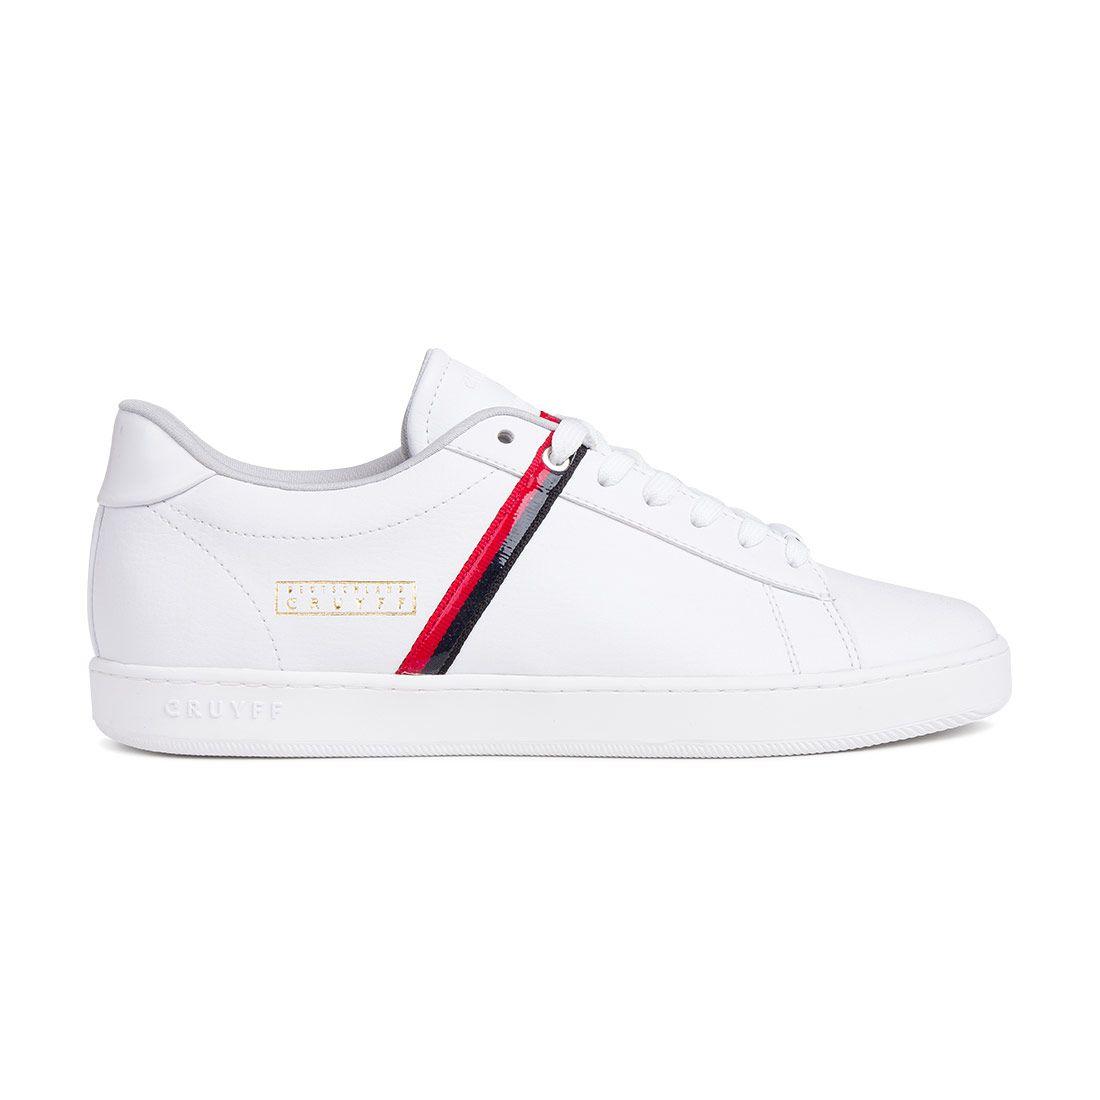 Cruyff Sylva Germany Sneakers Wit Zwart Rood